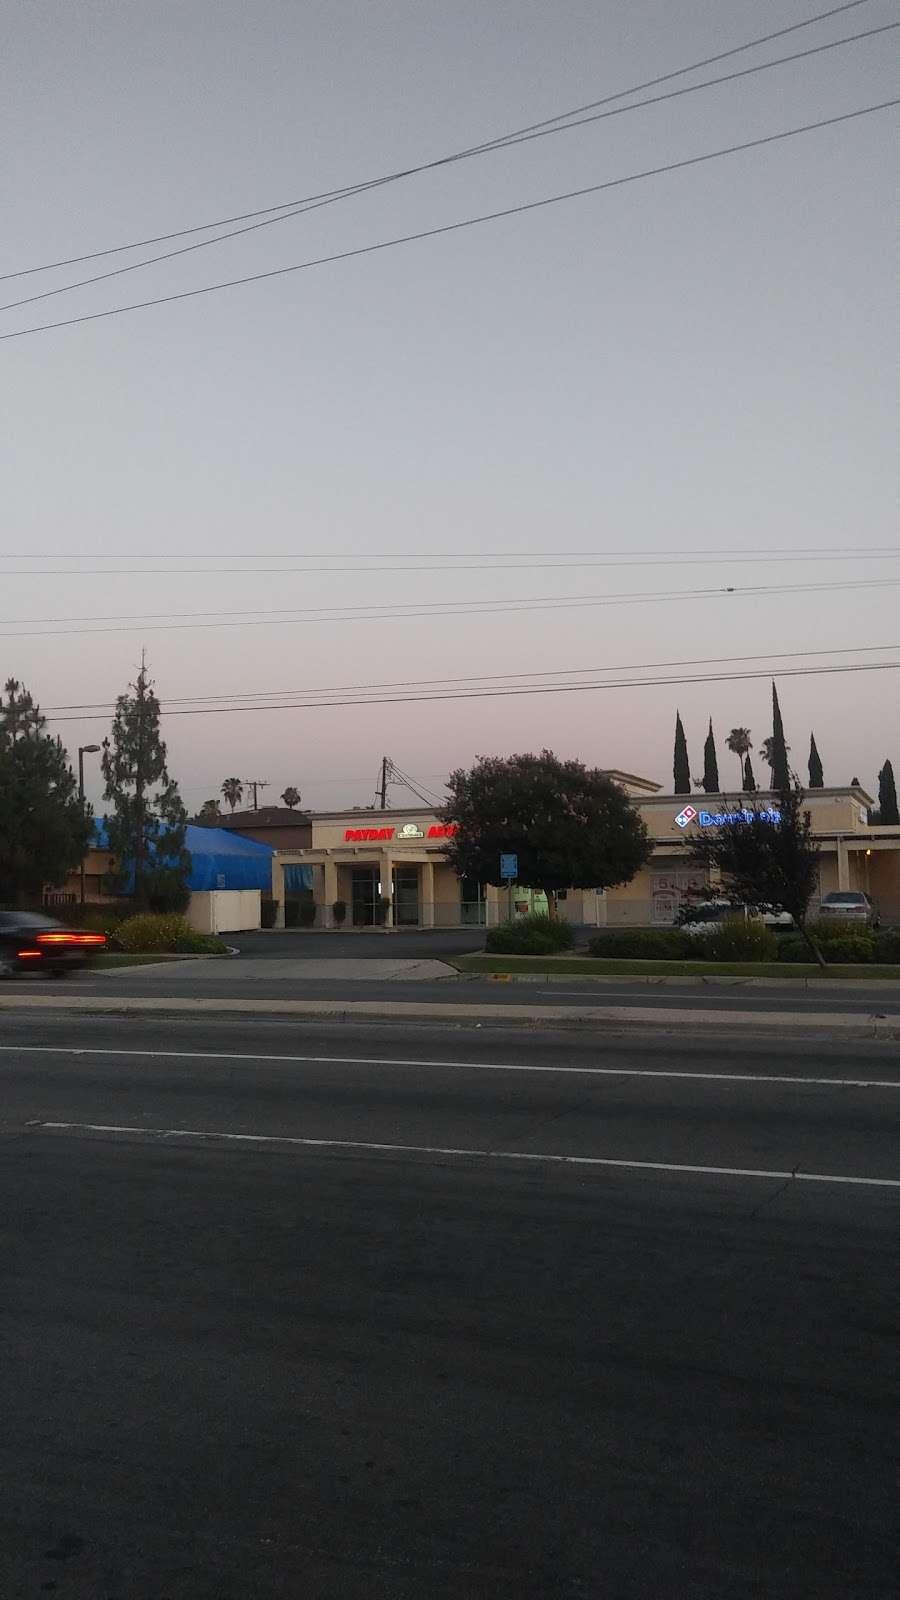 Cashback Loans - local government office  | Photo 3 of 7 | Address: 25715 Redlands Blvd b, Redlands, CA 92373, USA | Phone: (909) 557-1199